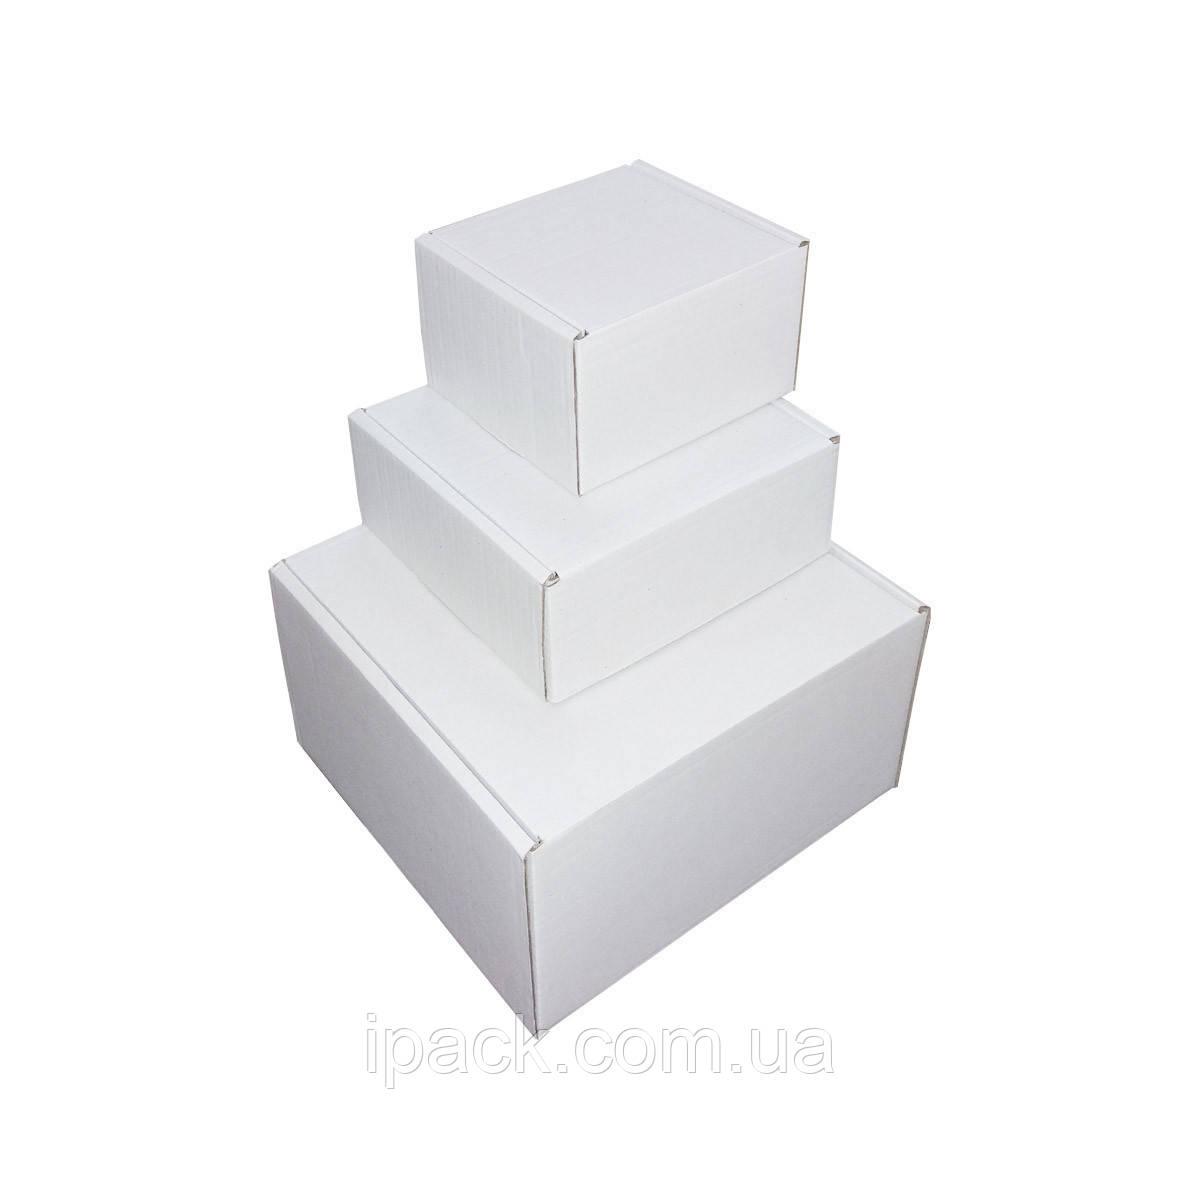 Коробка картонная самосборная, 230*175*100, мм, белая, микрогофрокартон